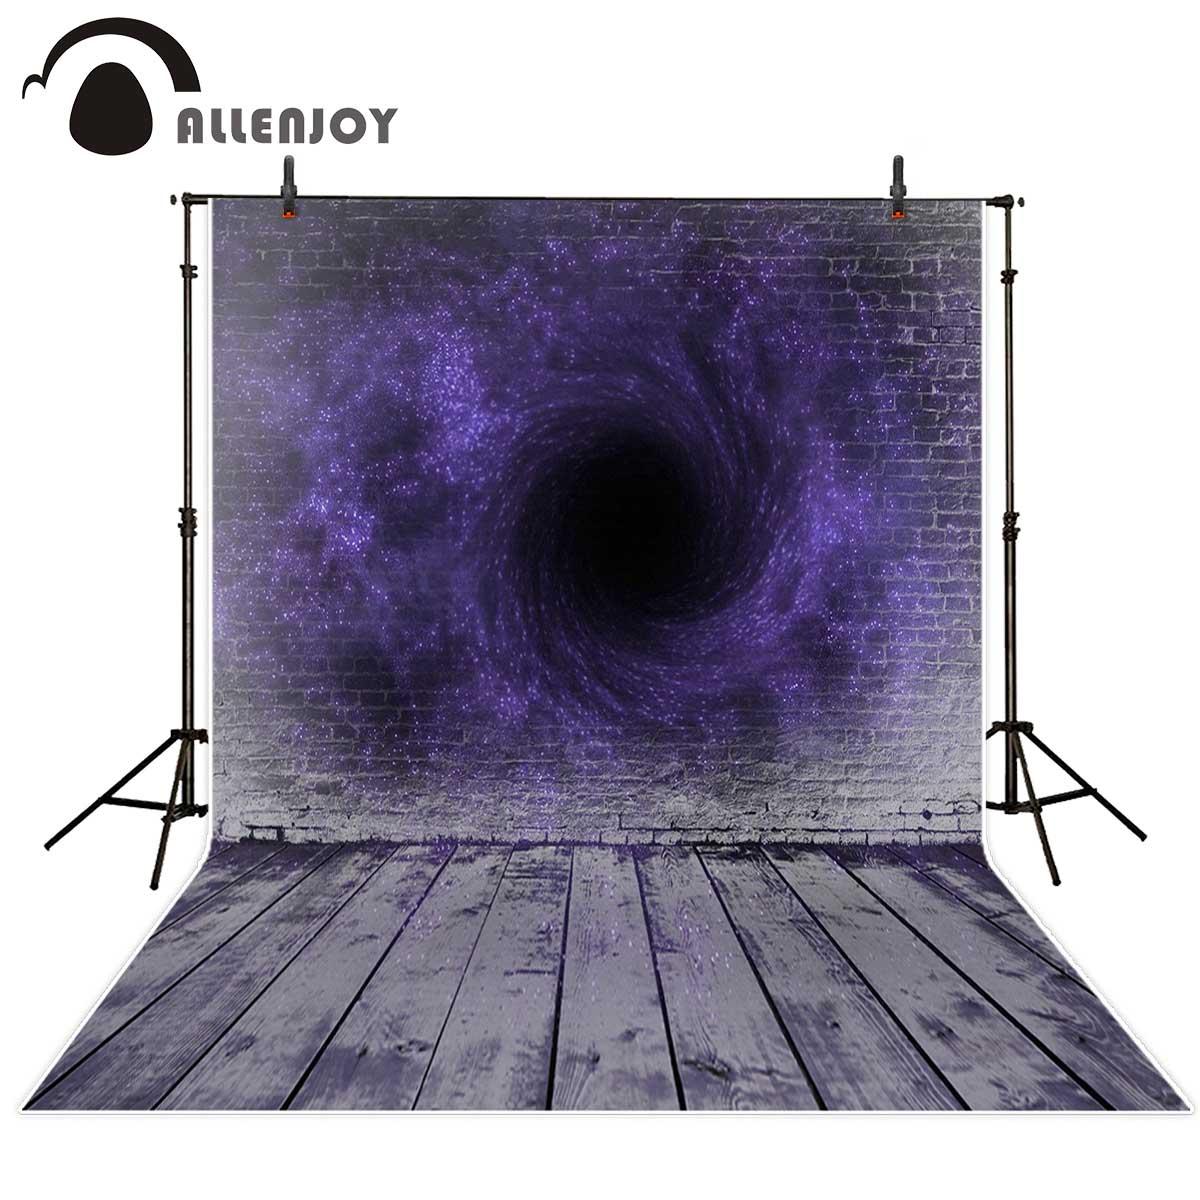 Allenjoy Halloween backdrop brick wall wooden floor secret purple magic vortex black hole photo backdrop background photography